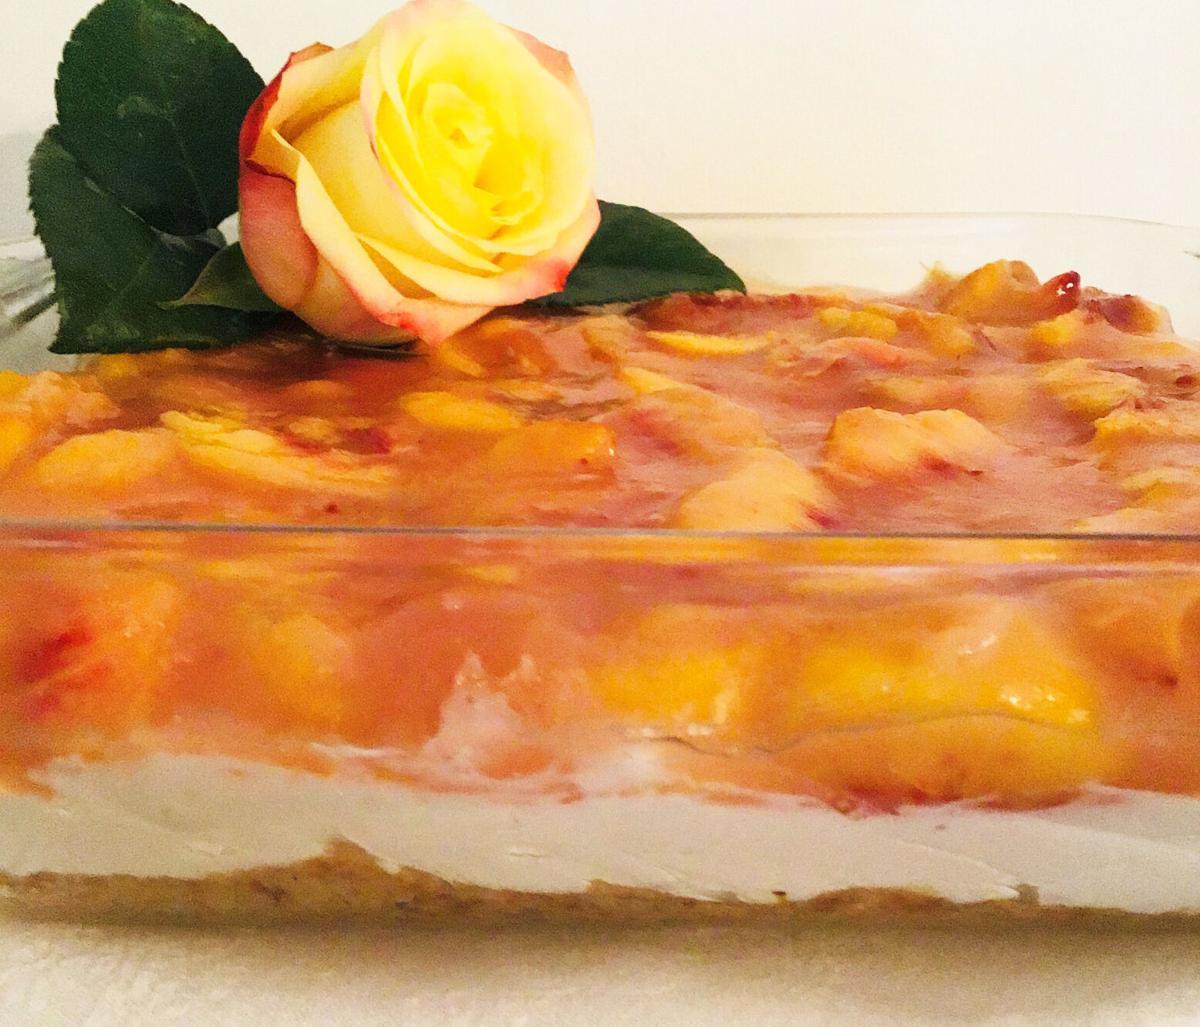 Peach Paradise Dessert